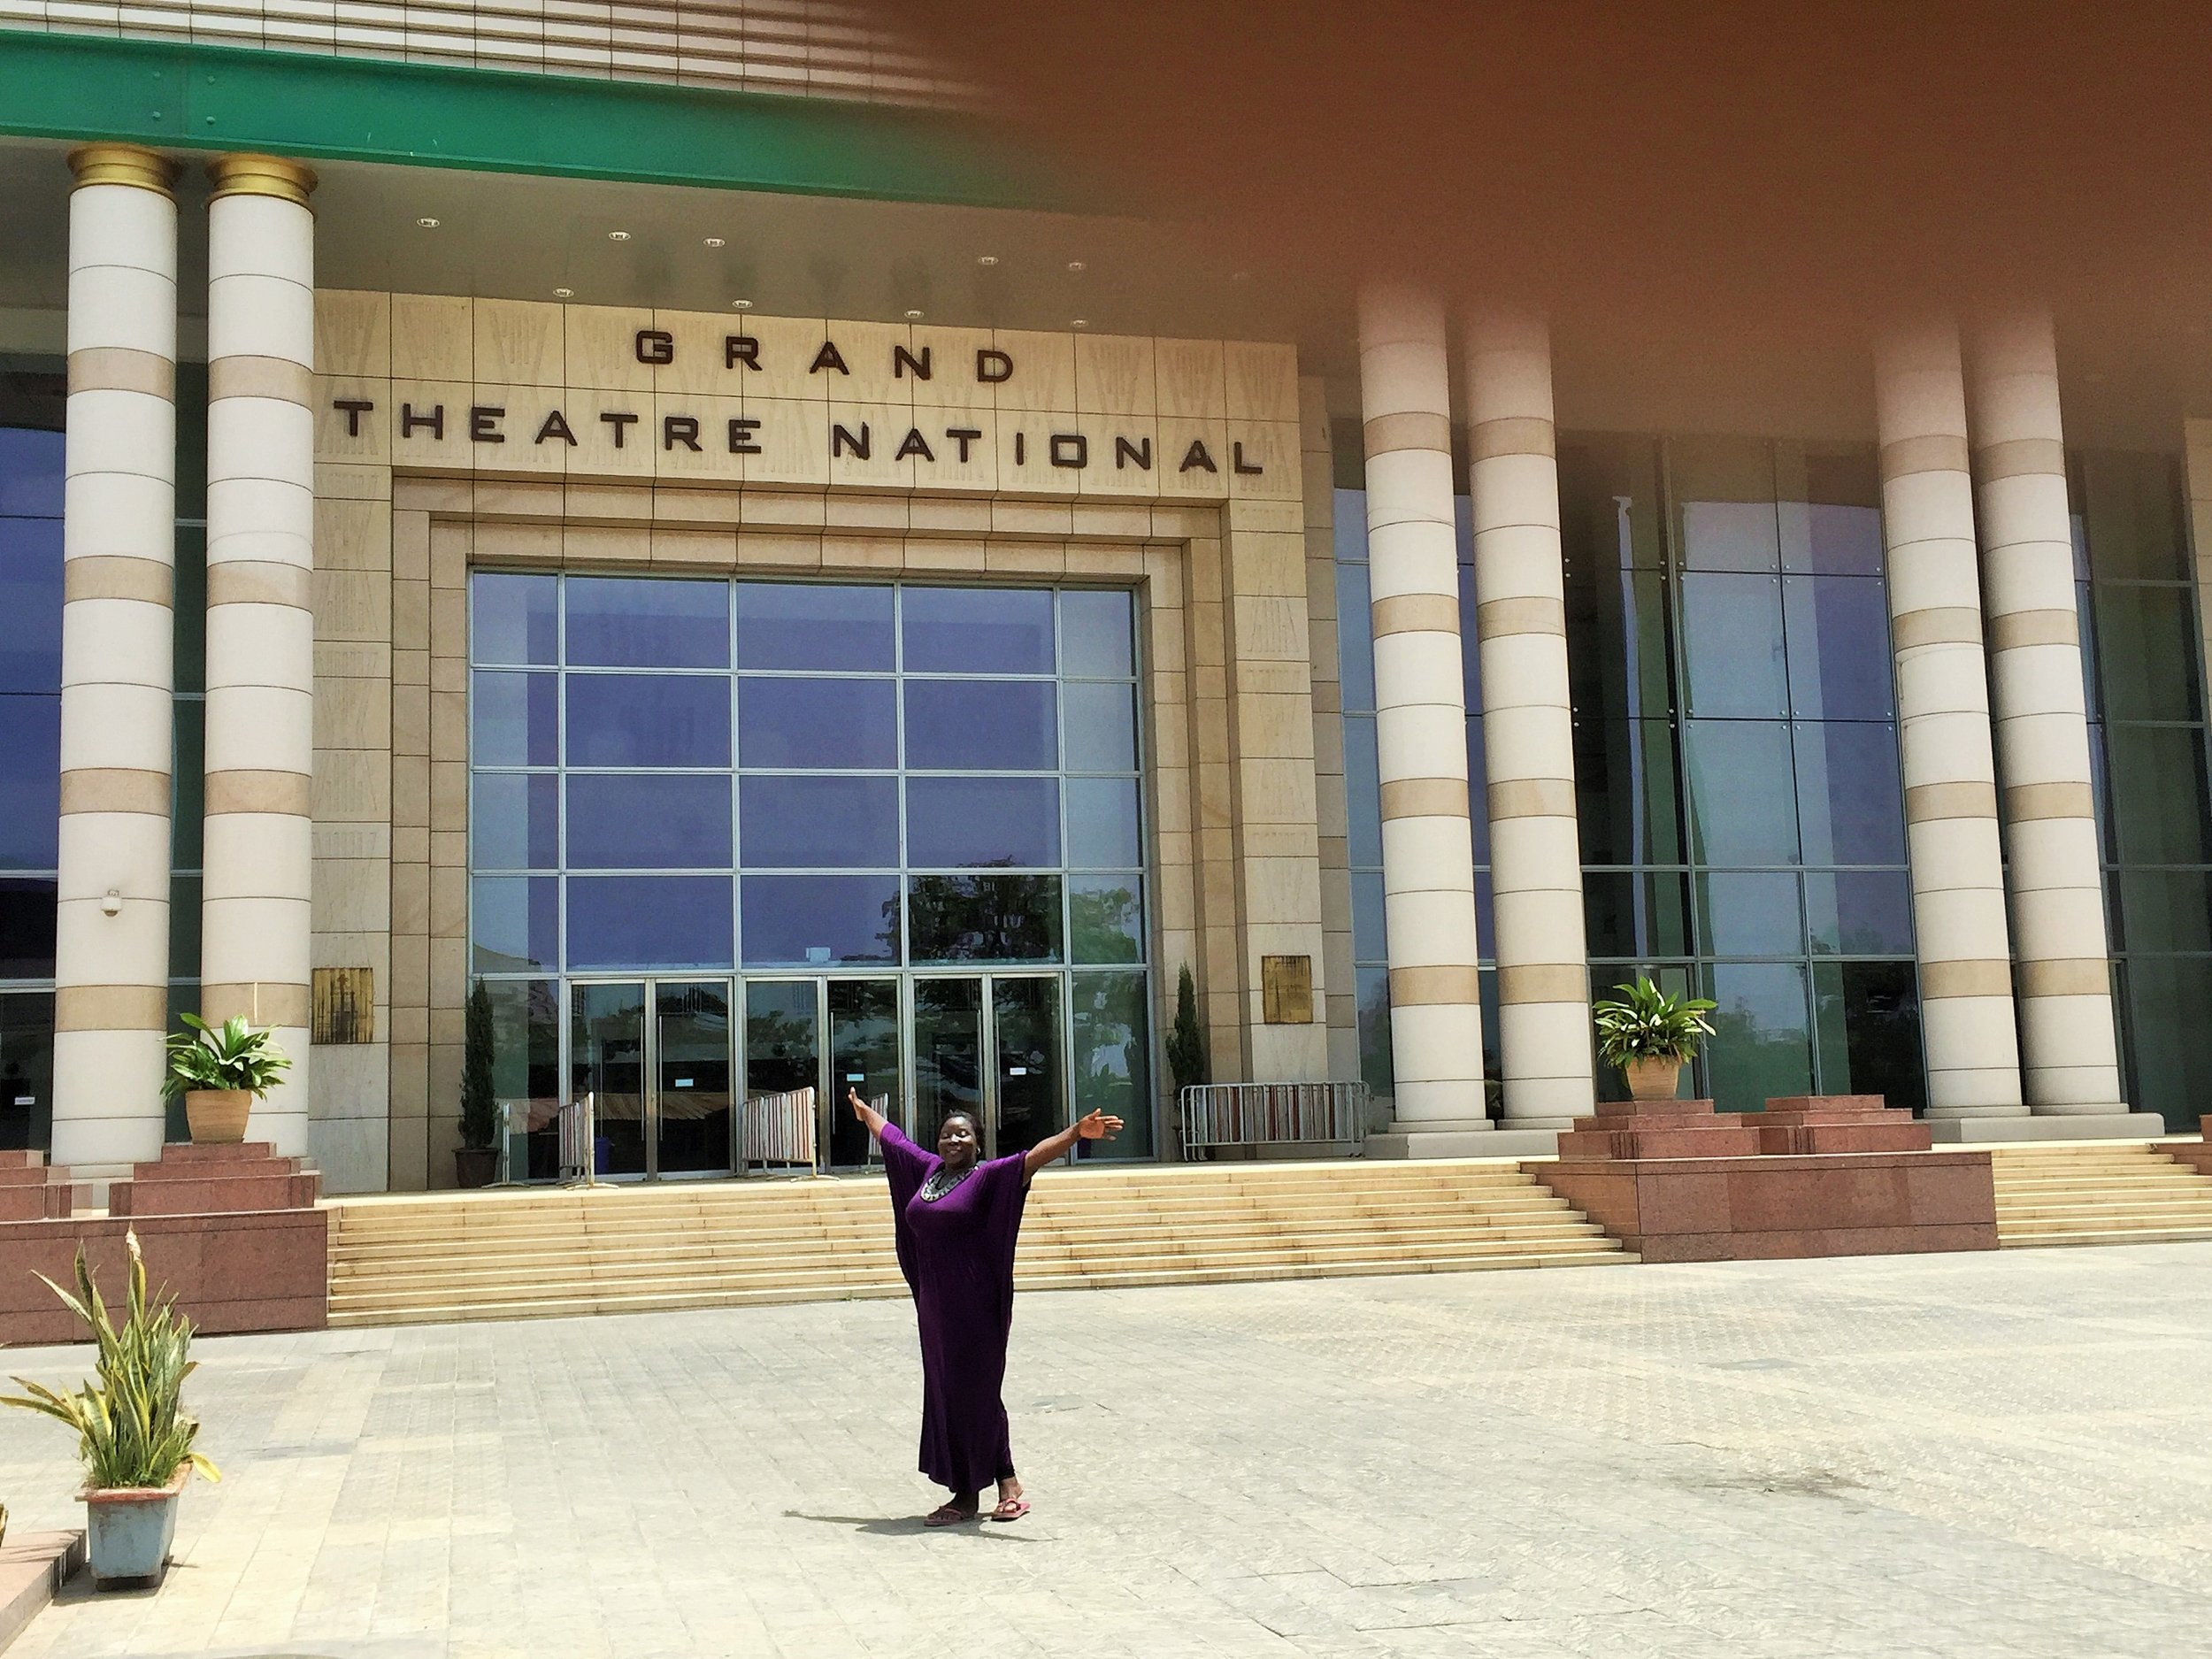 Grand Theatre National